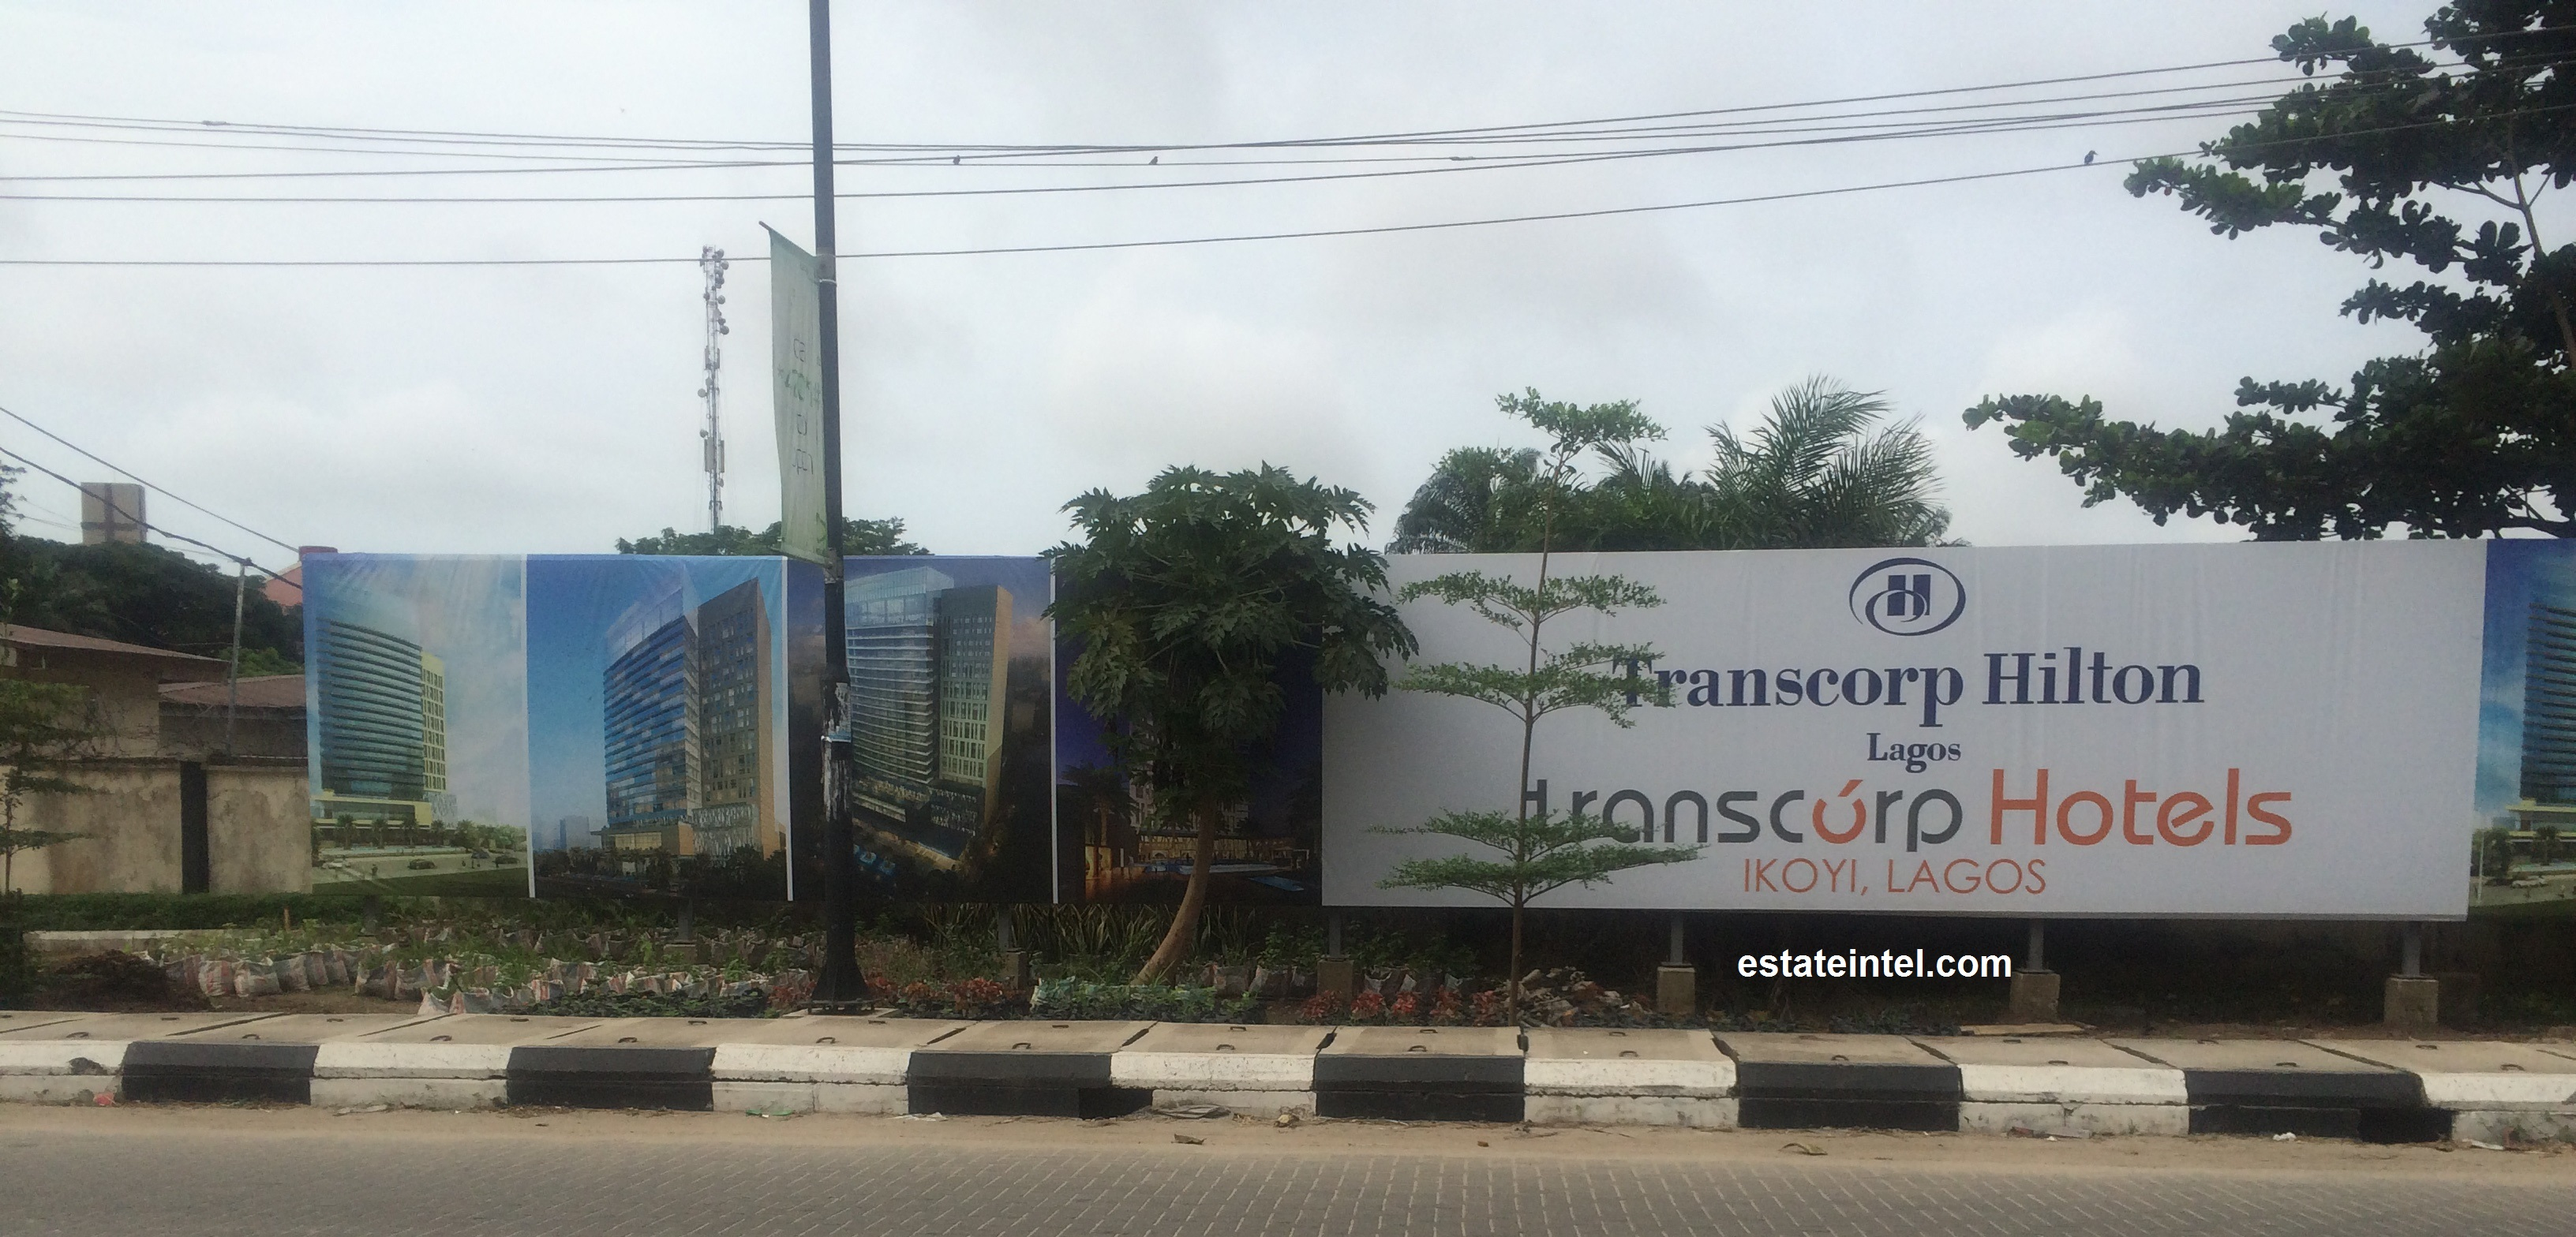 Transcorp Hilton Lagos, Ikoyi.